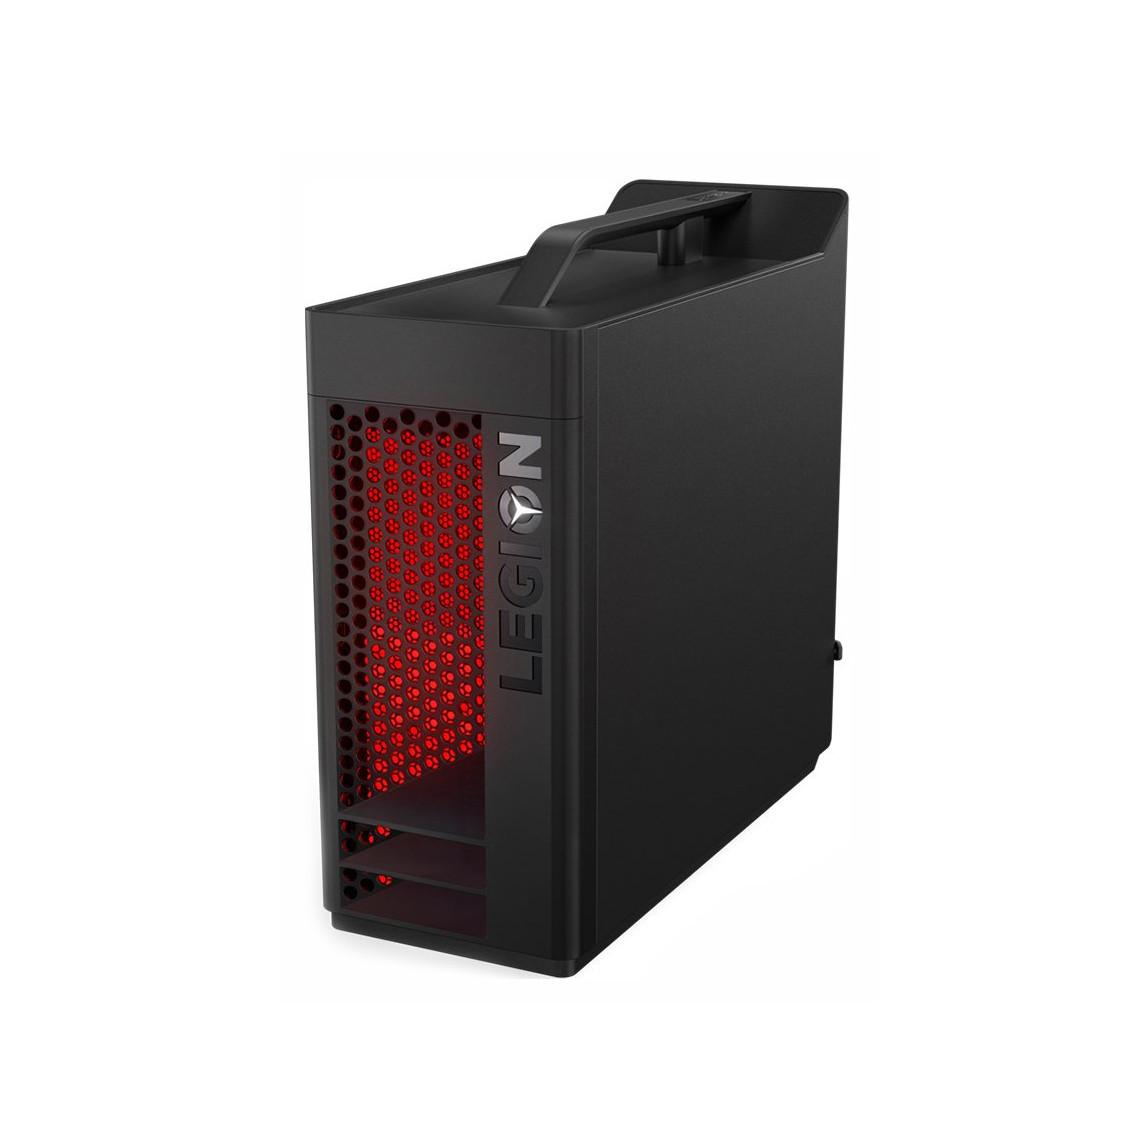 Пк Lenovo Legion T730-28ICO (Intel Core i7 6 ядер 16 Гб HDD SSD 1000 Гб 128 Гб DVD-RW DOS) 90JF000URK